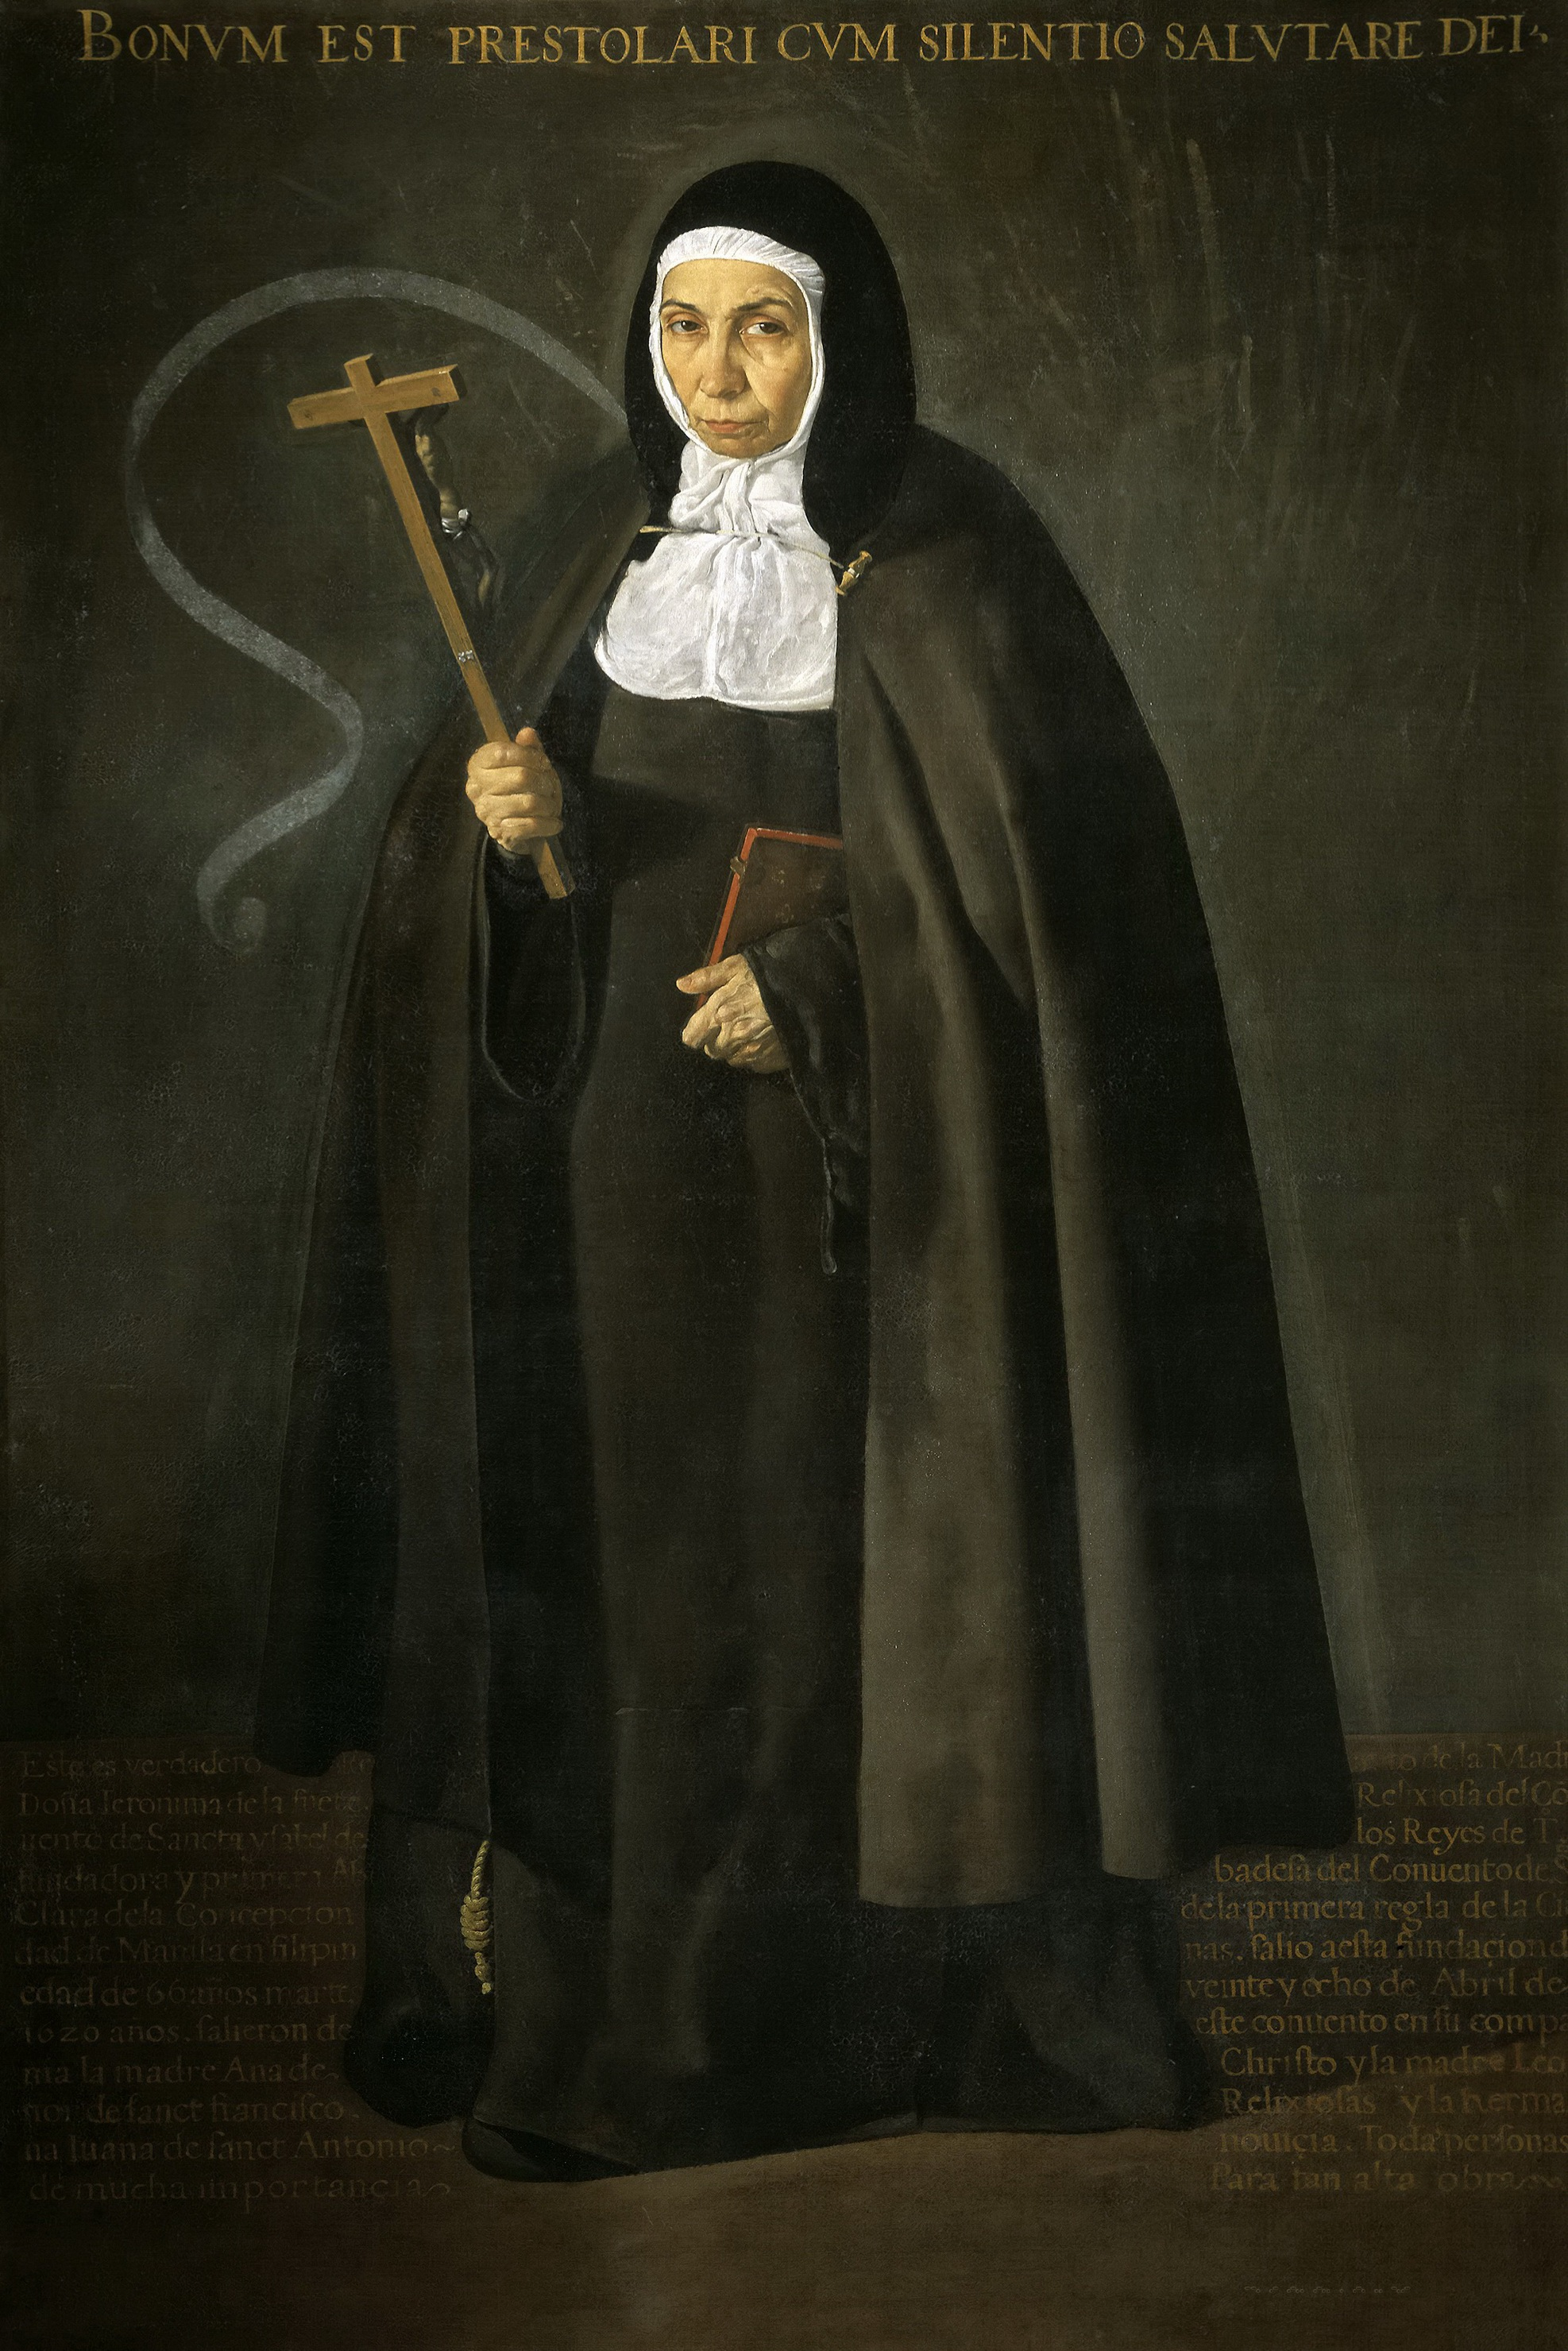 Диего Веласкес. Матушка Херонима де ла Фуэнте. 1620